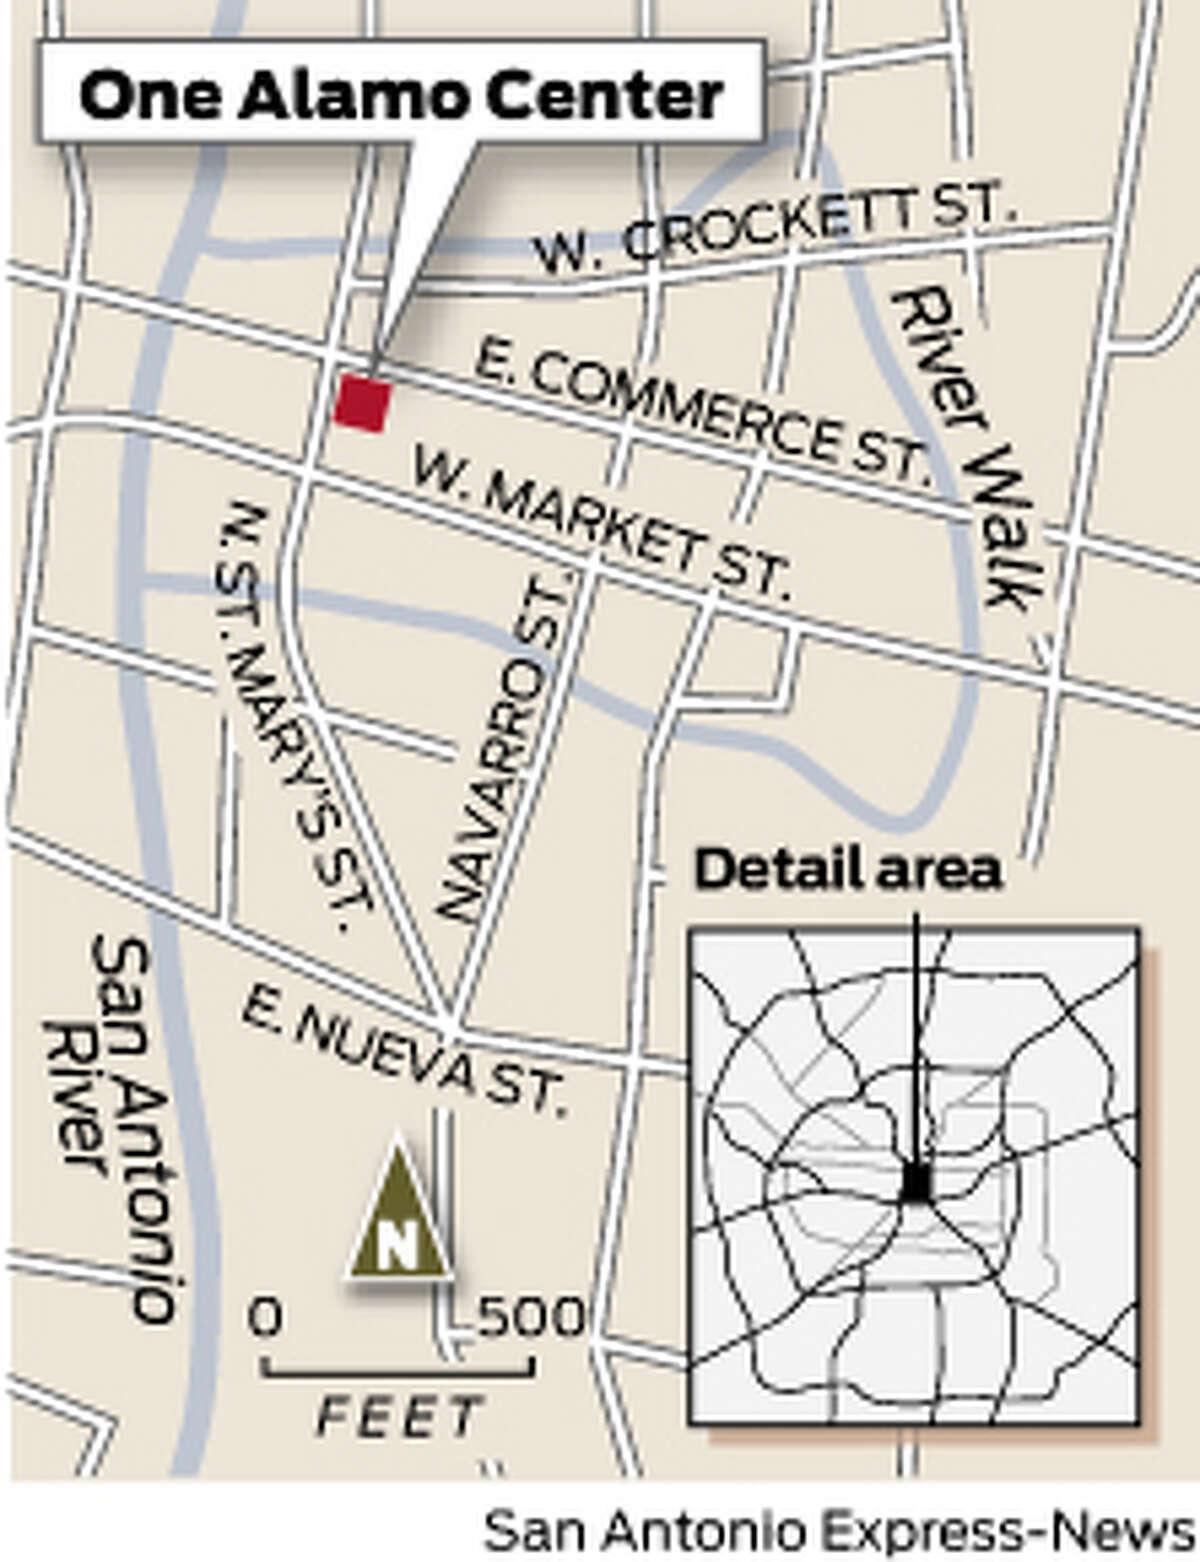 Entrada Partners also owns One Alamo Center.